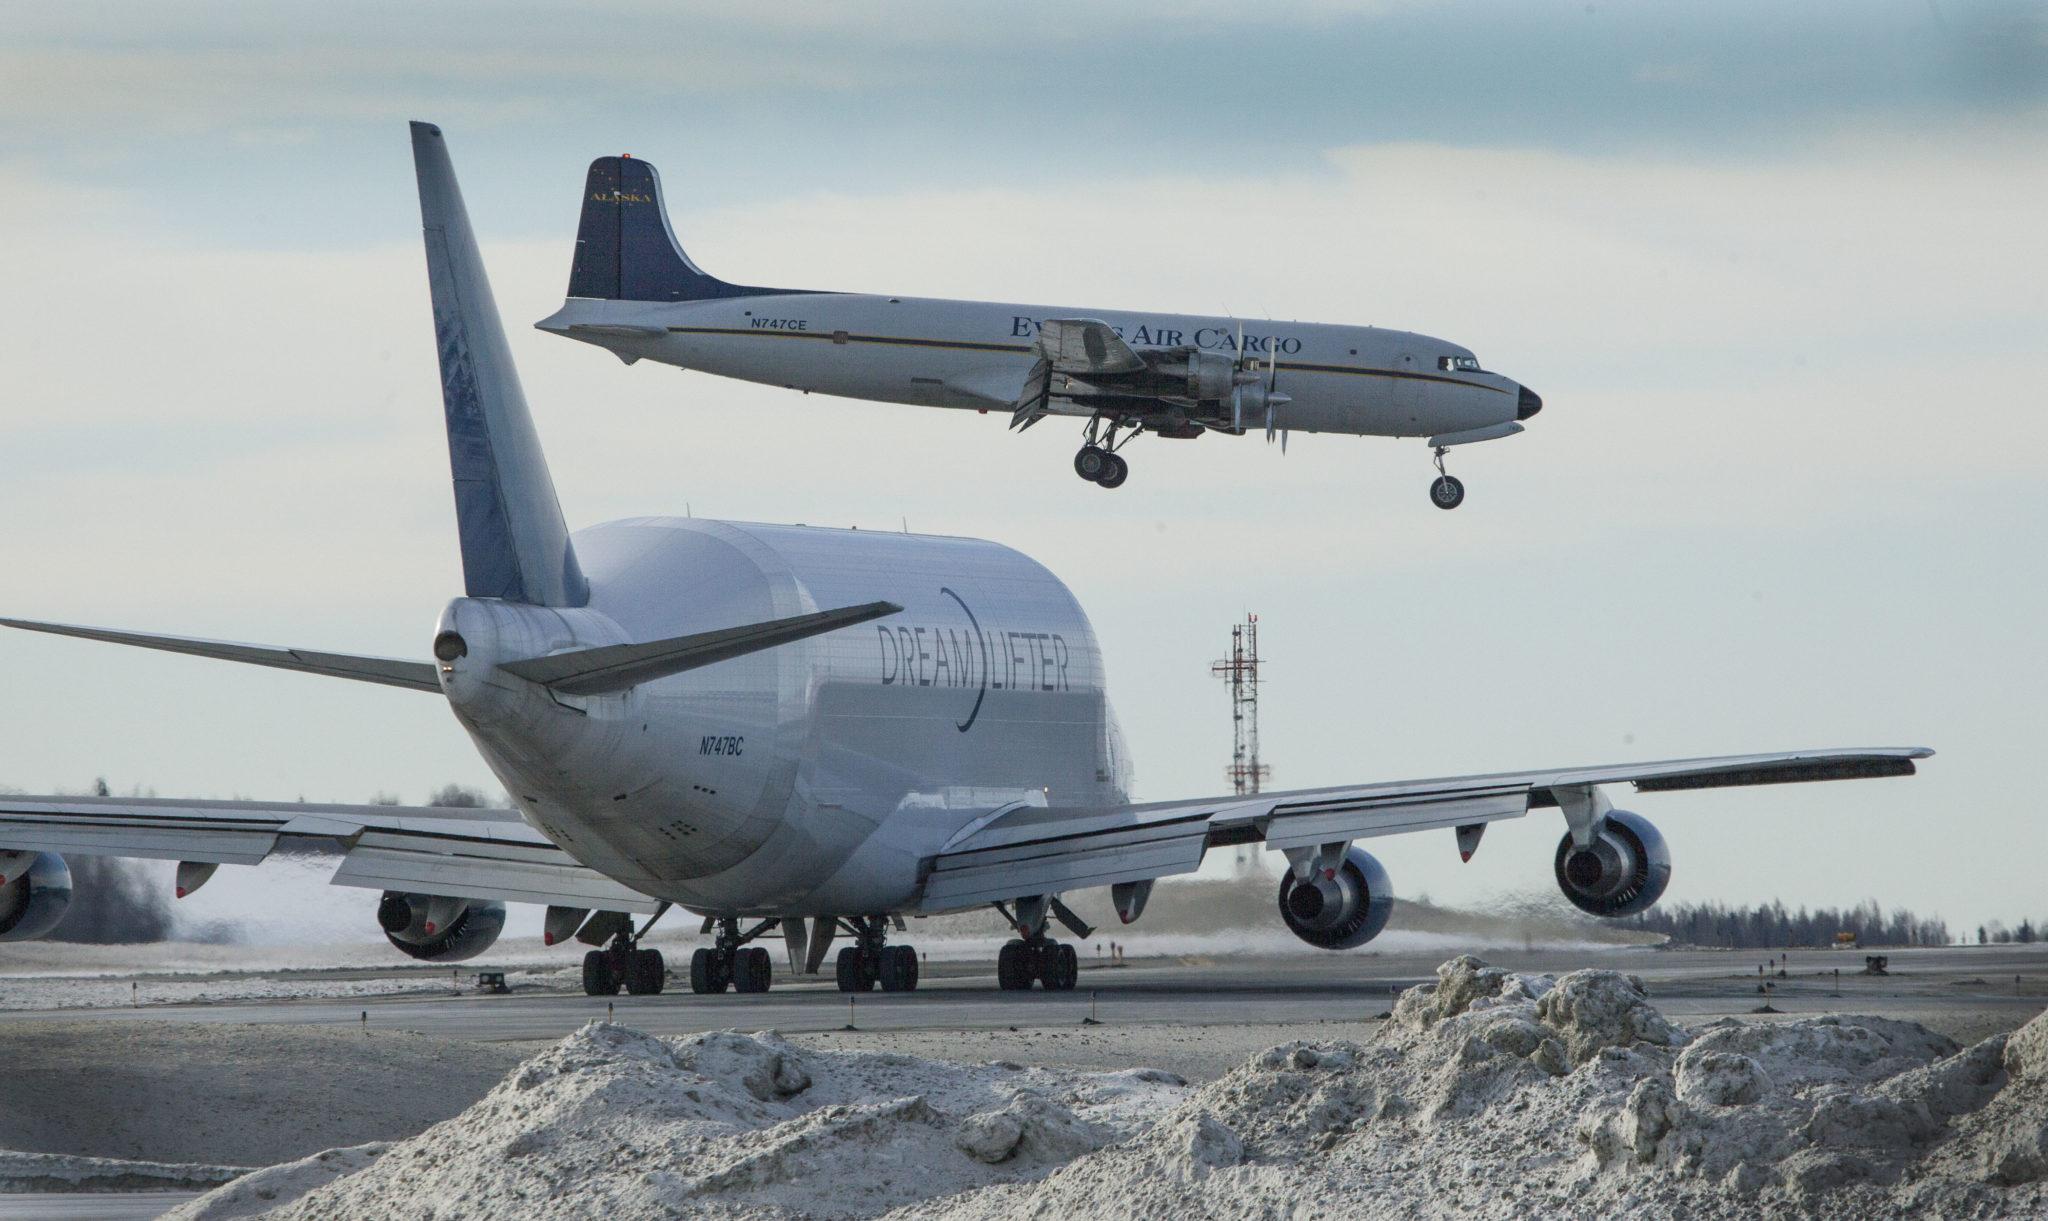 Alaska, photography, stop action, best aircraft photography